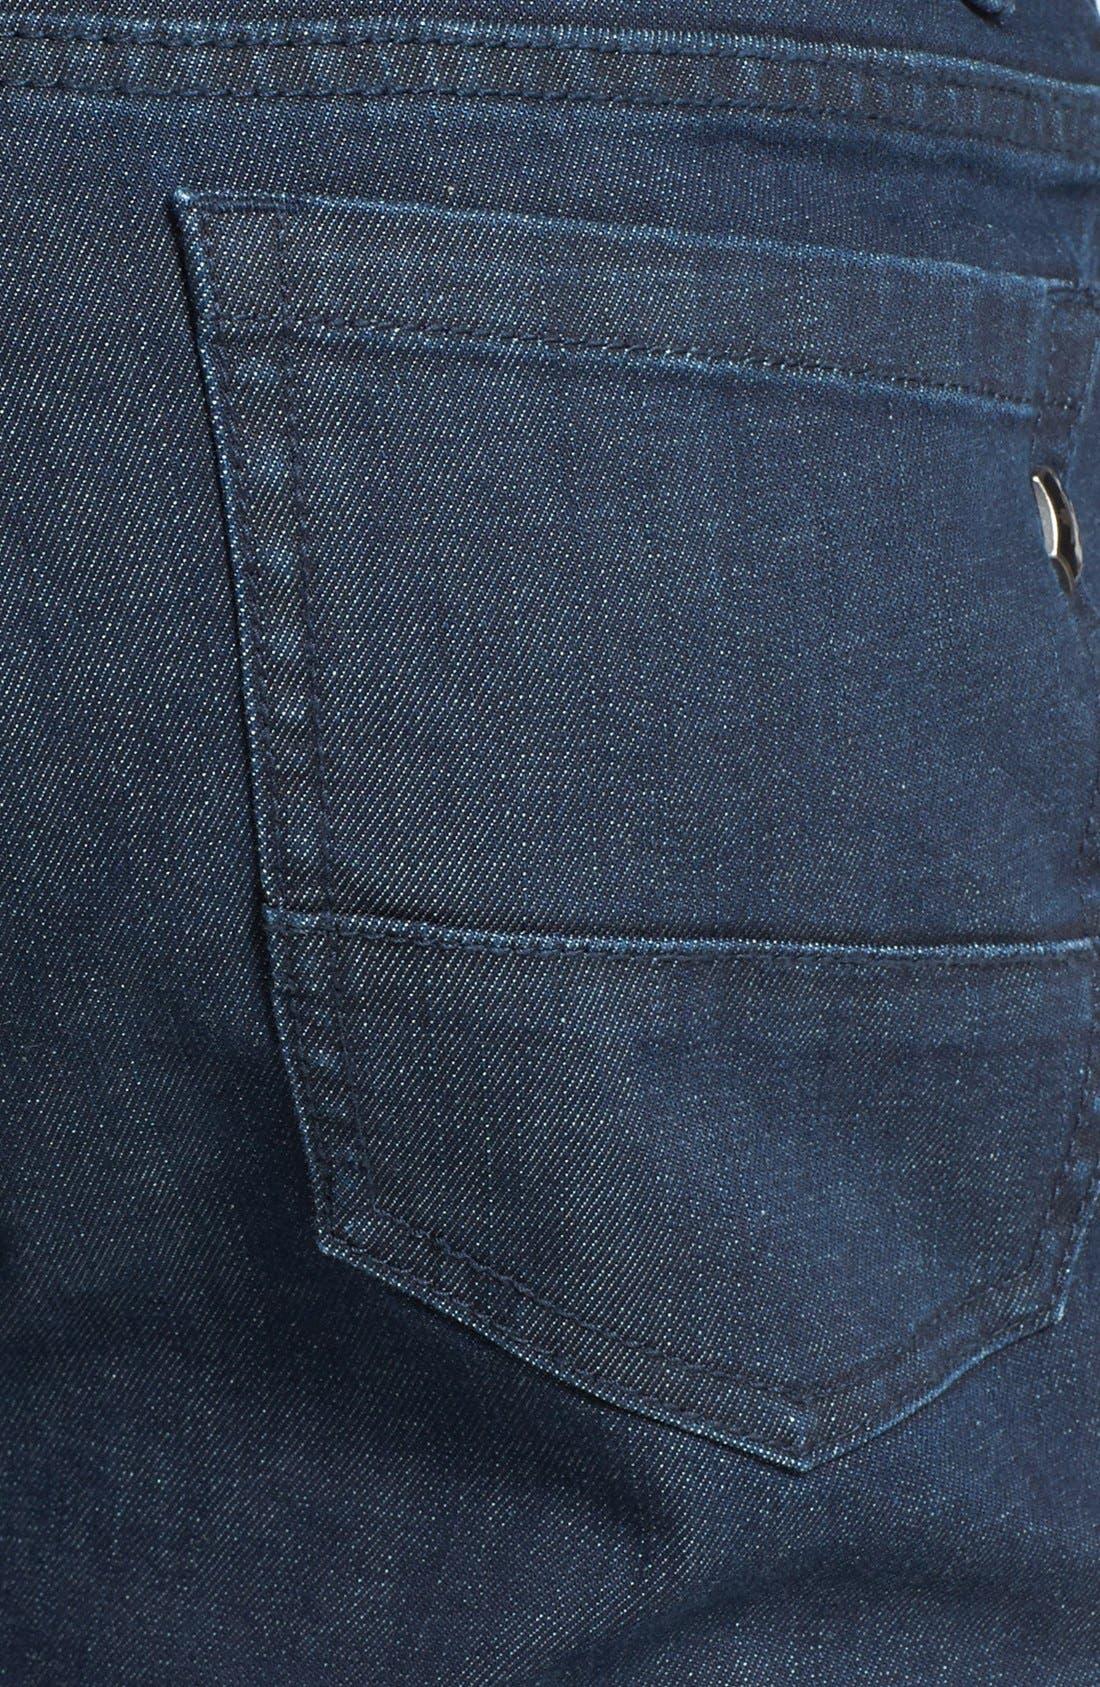 'Esher' Enzyme Wash Straight Leg Jeans,                             Alternate thumbnail 3, color,                             417